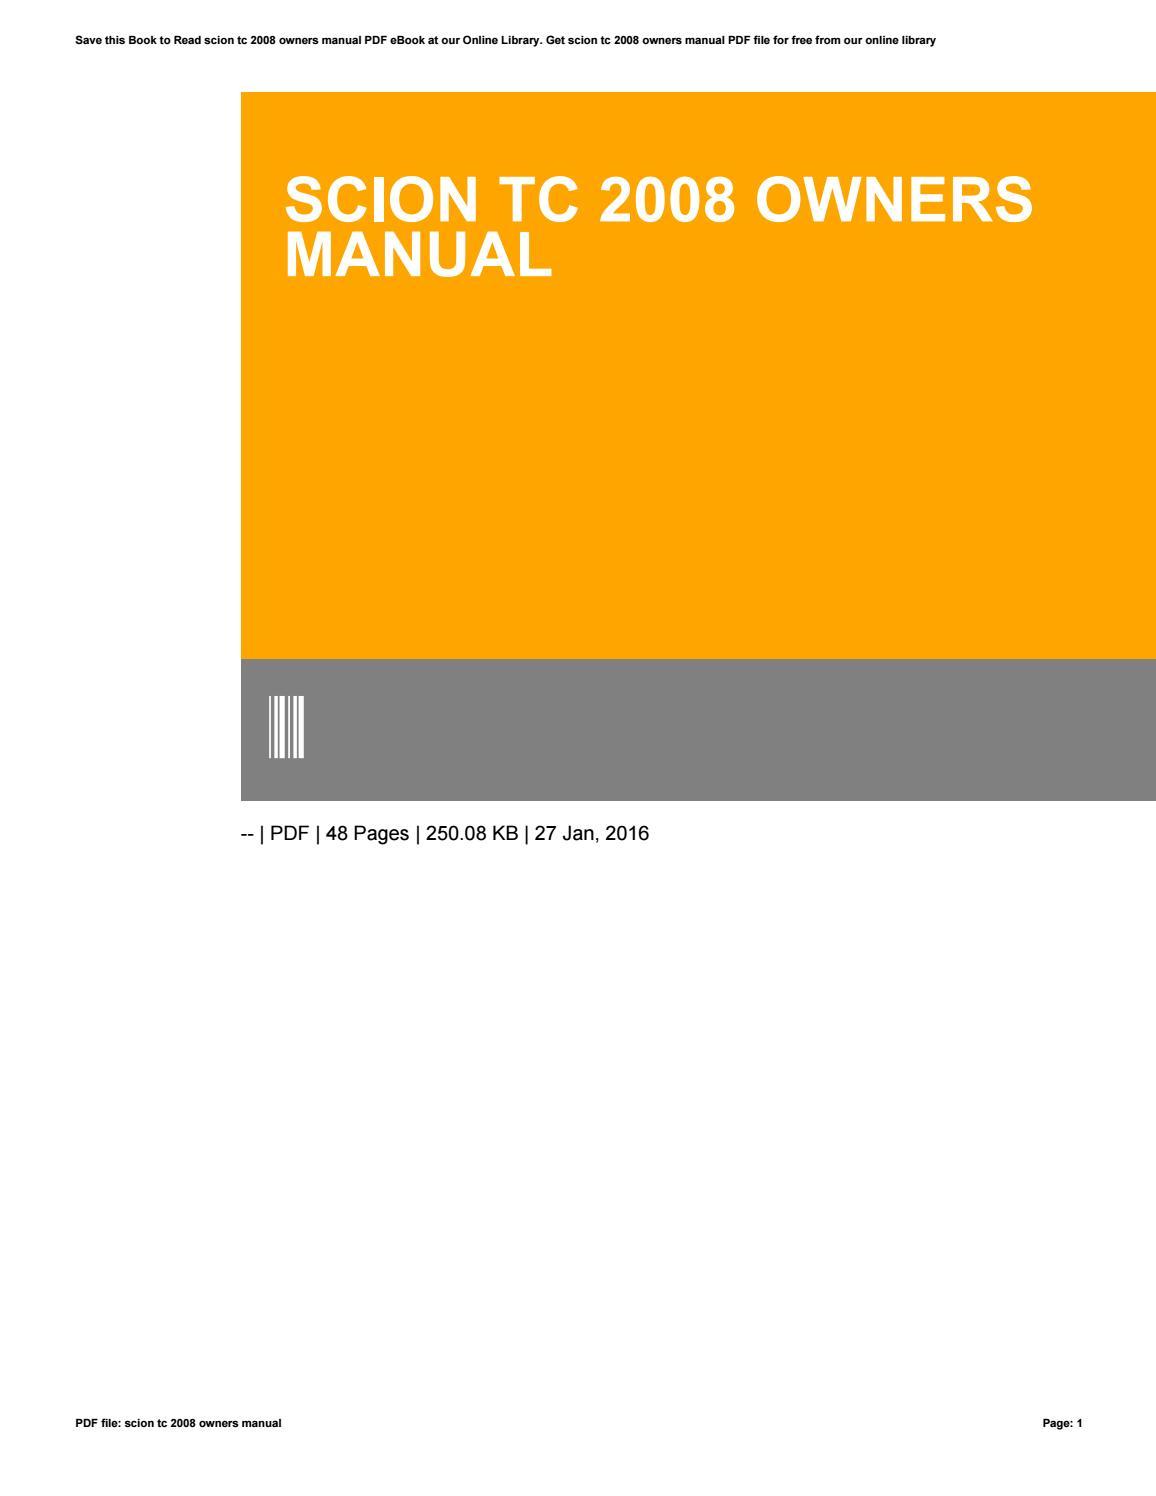 2008 scion tc owners manual pdf free download